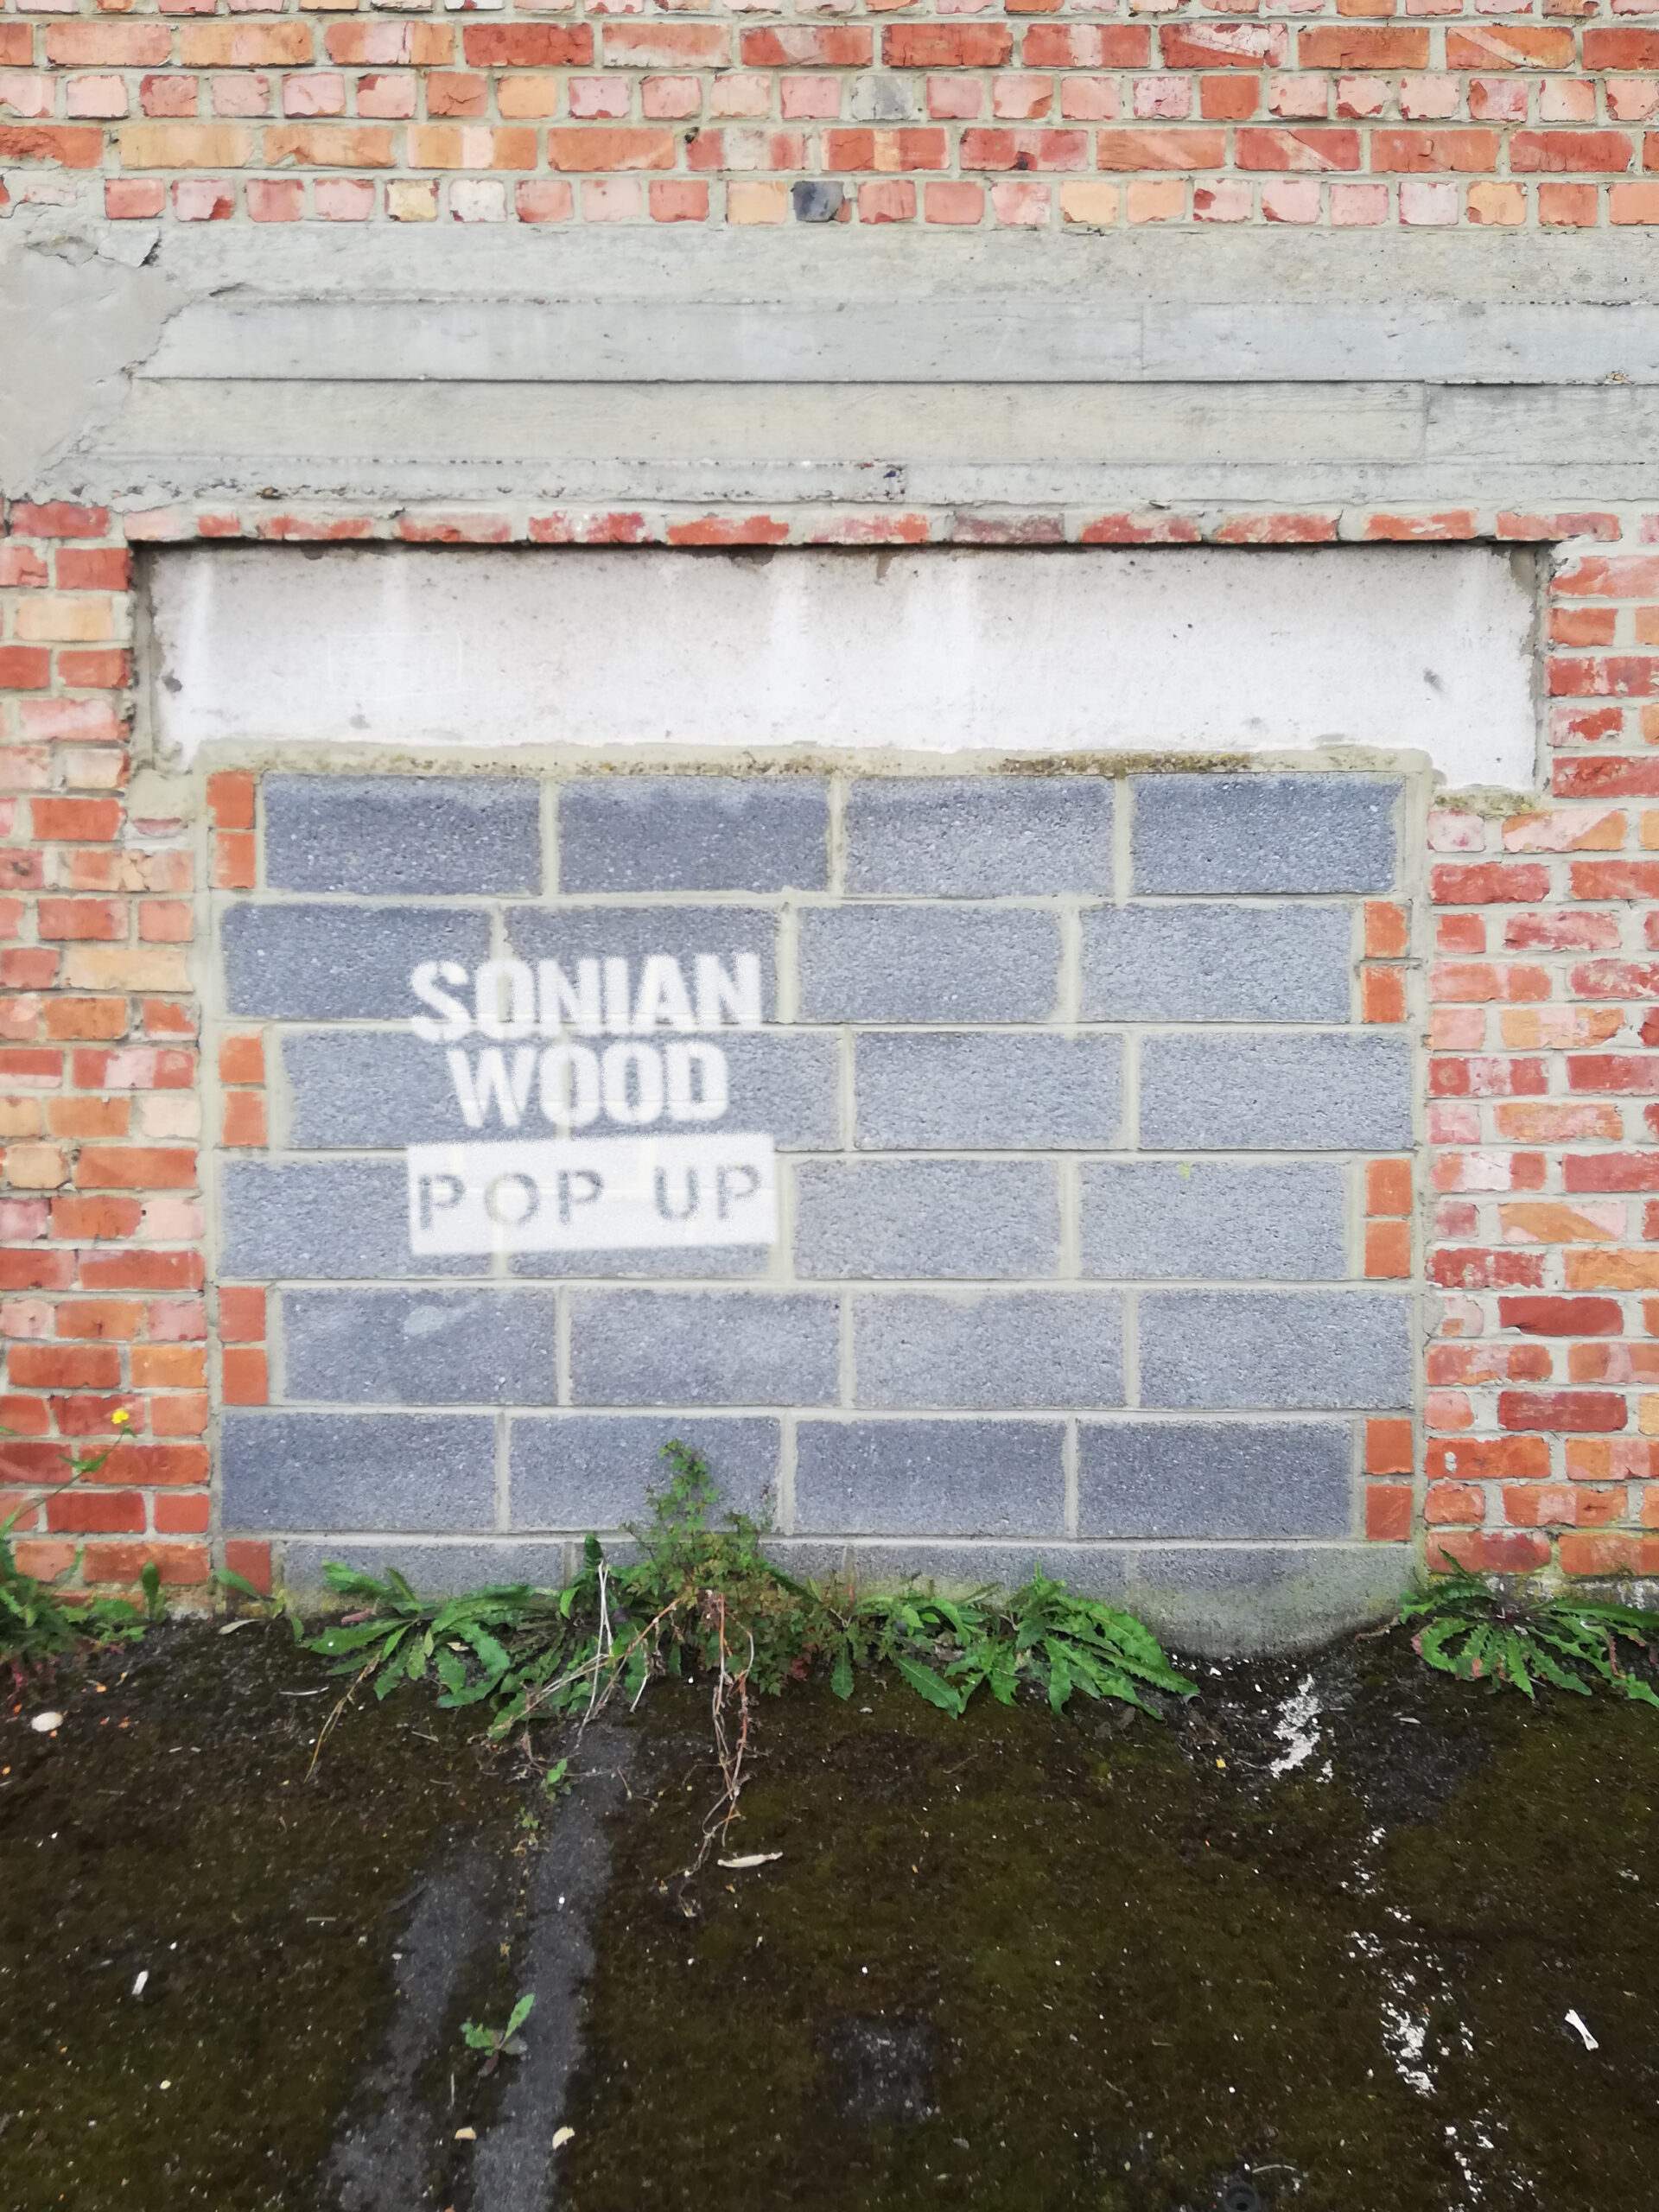 pop up local wood shop